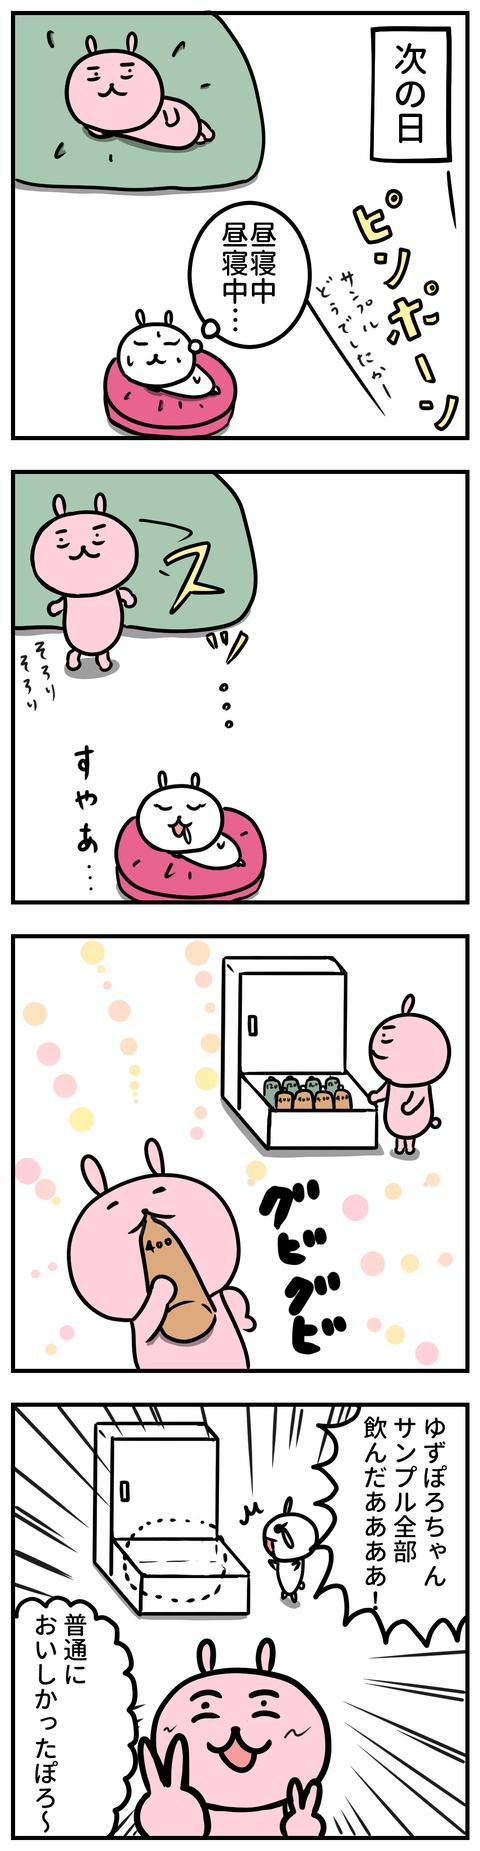 manga-yuzuporo41-2